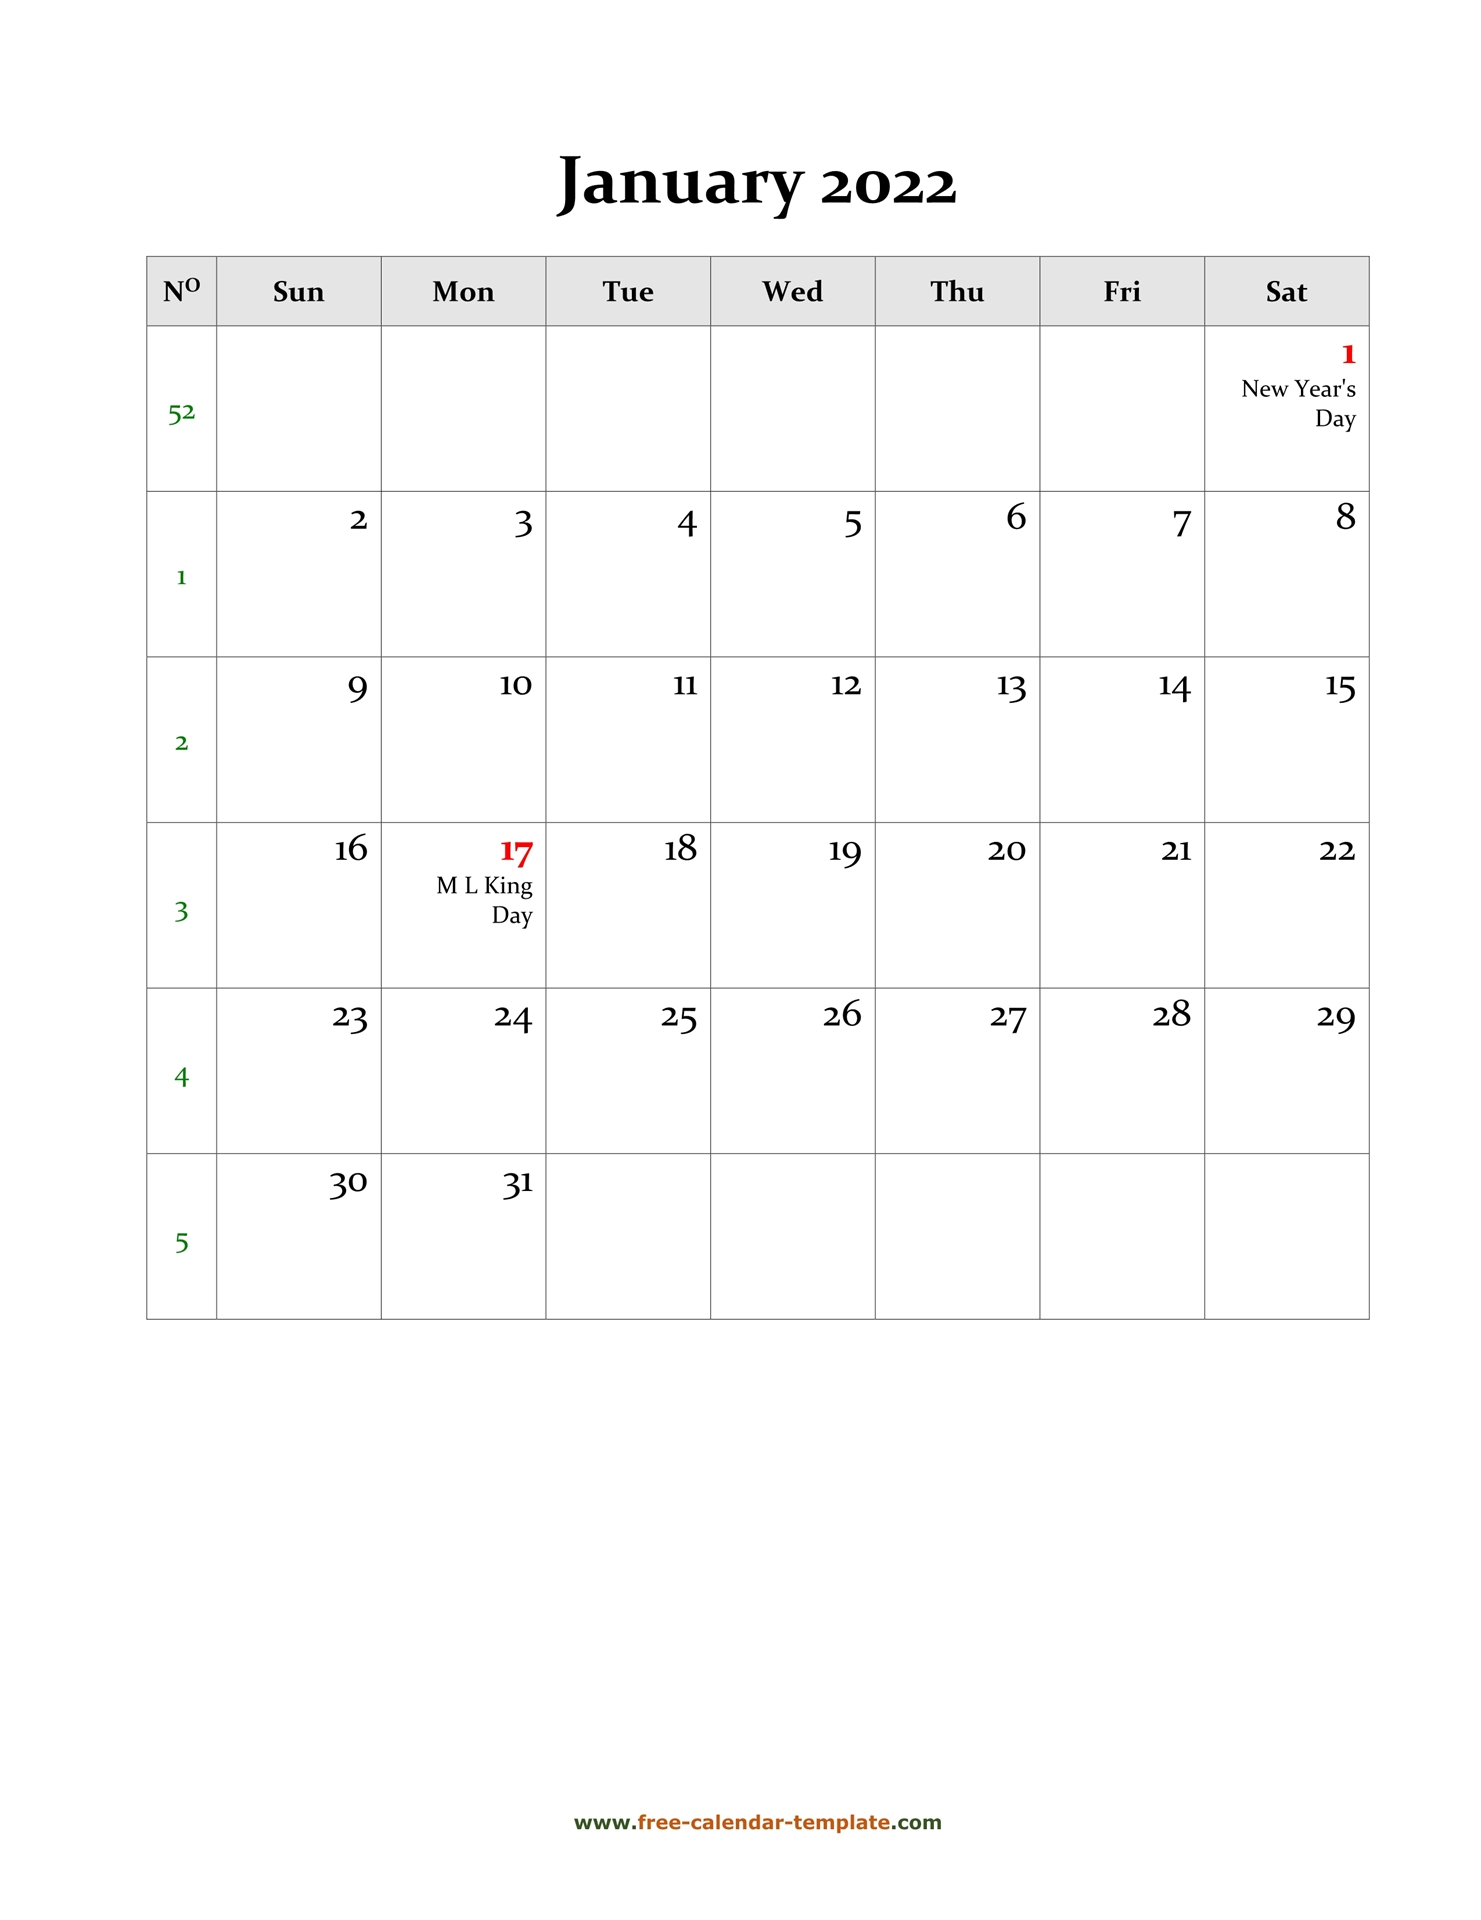 2022 Monthly Calendar (Blank Vertical Template)   Free Regarding January 2022 Calendar Large Font